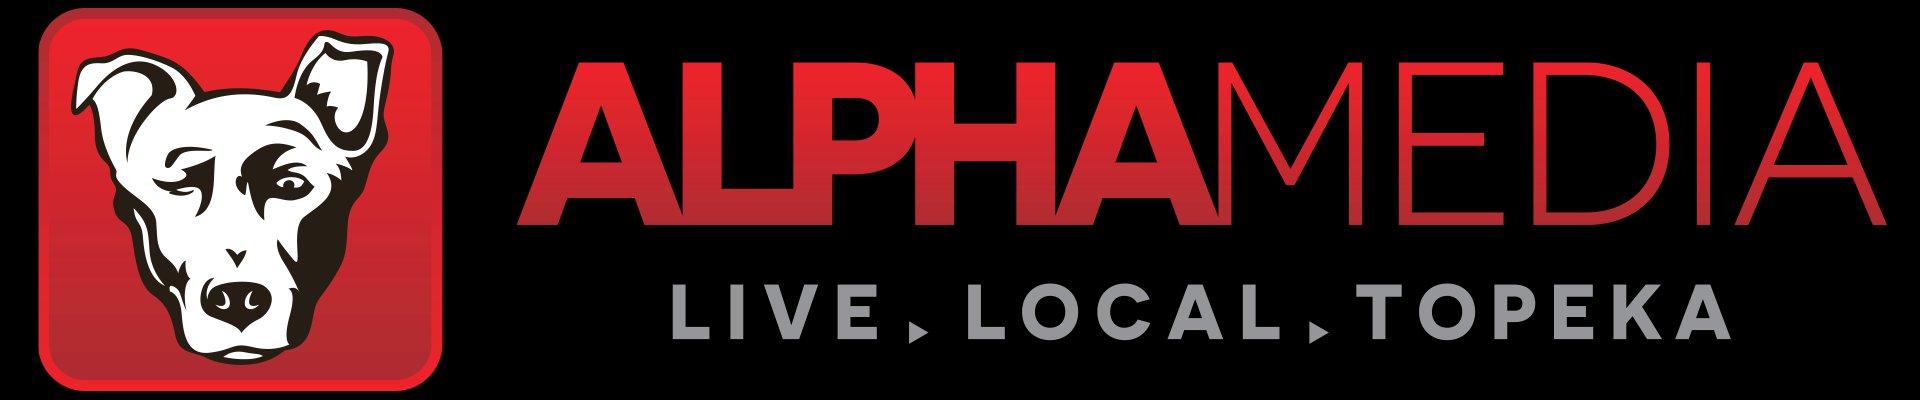 alphamedia-topeka-black-background